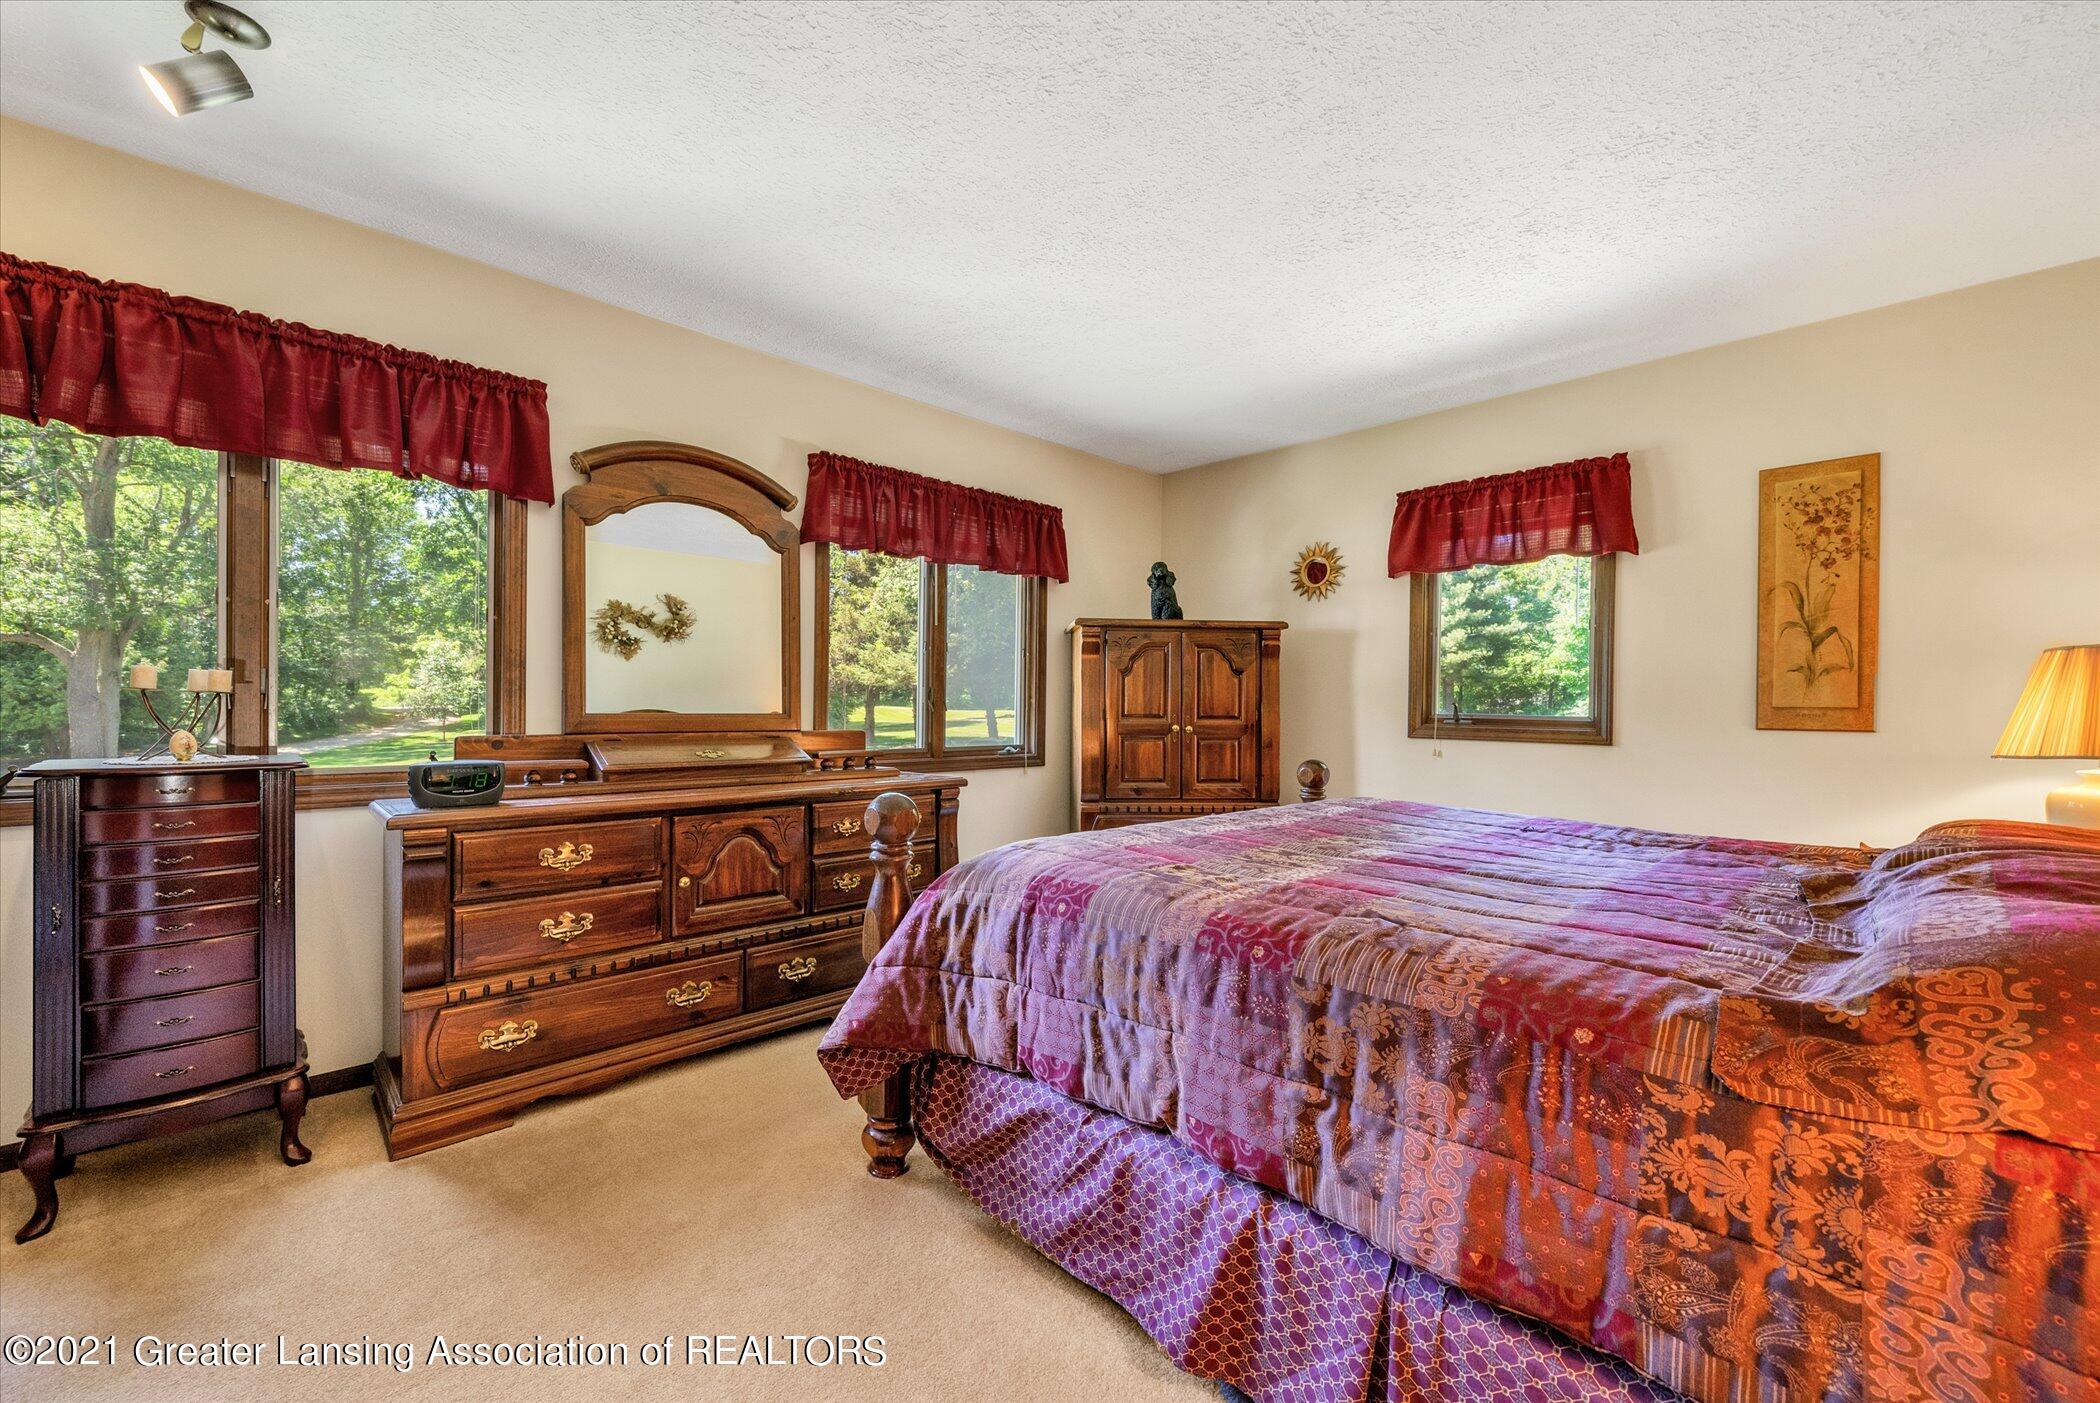 7851 S Cochran Rd - (23) MAIN FLOOR Bedroom 1 - 23